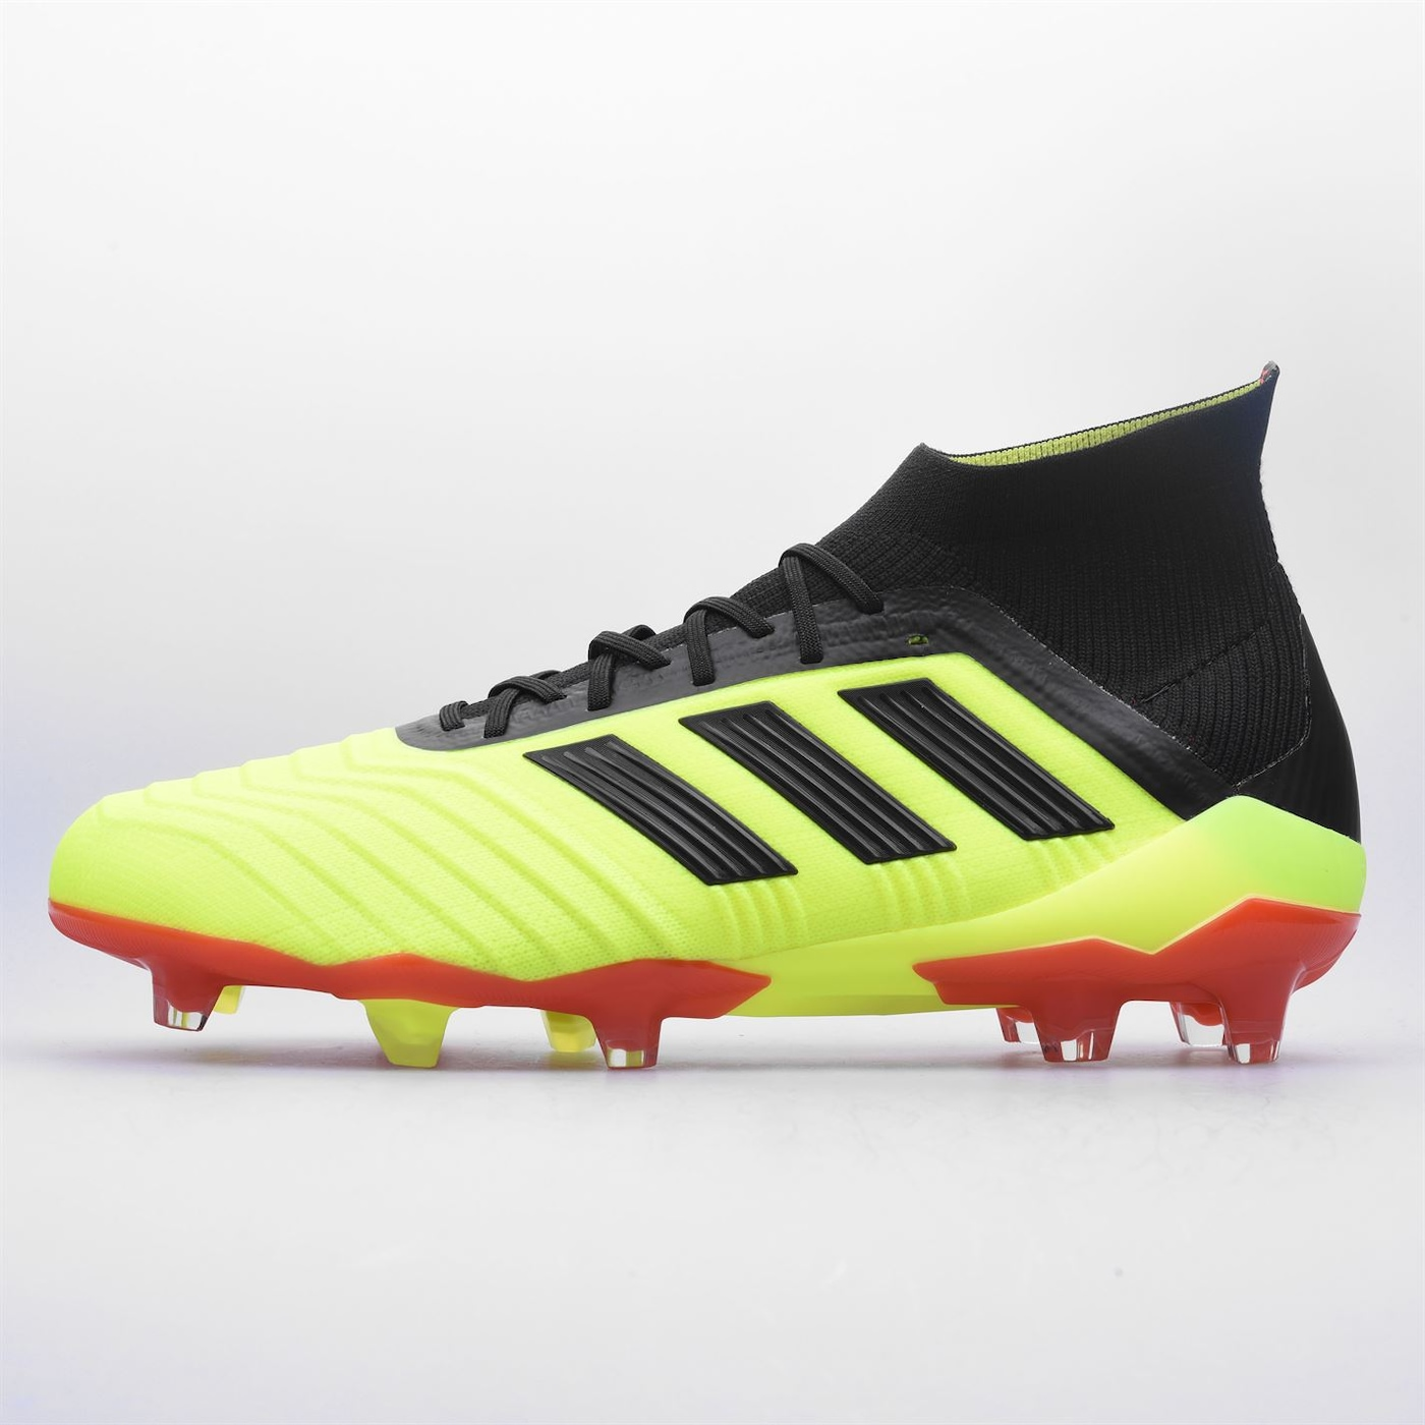 Adidas Predator 18.1 F FG